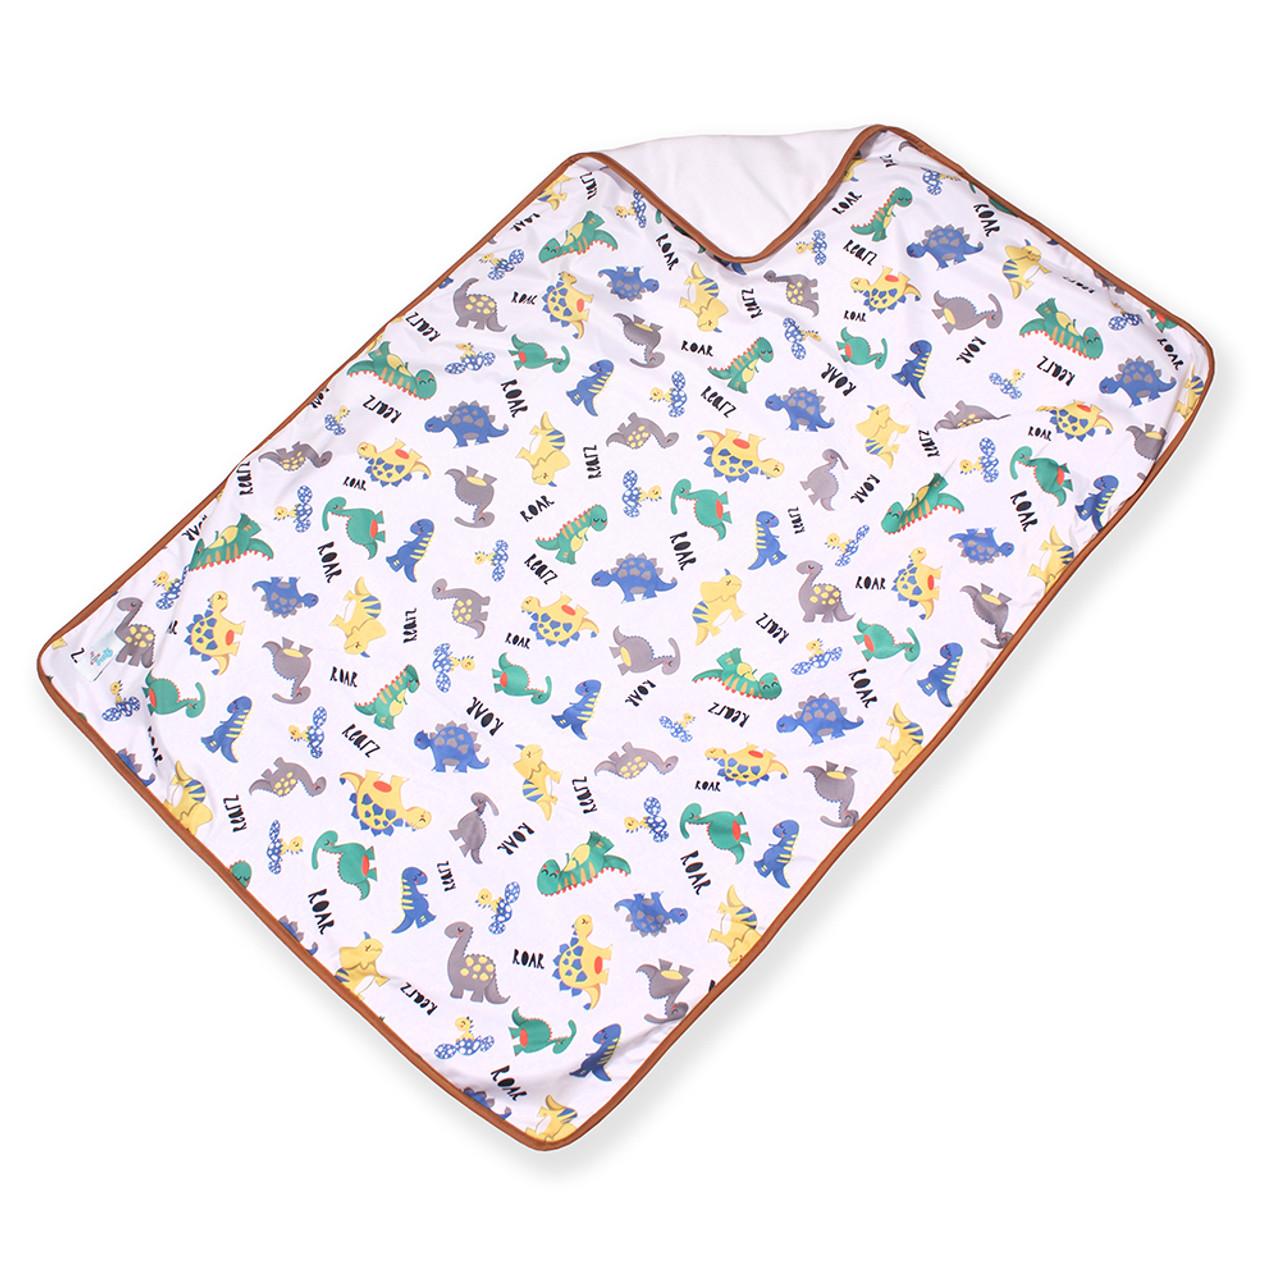 Rearz Safari Change//Bed Pad